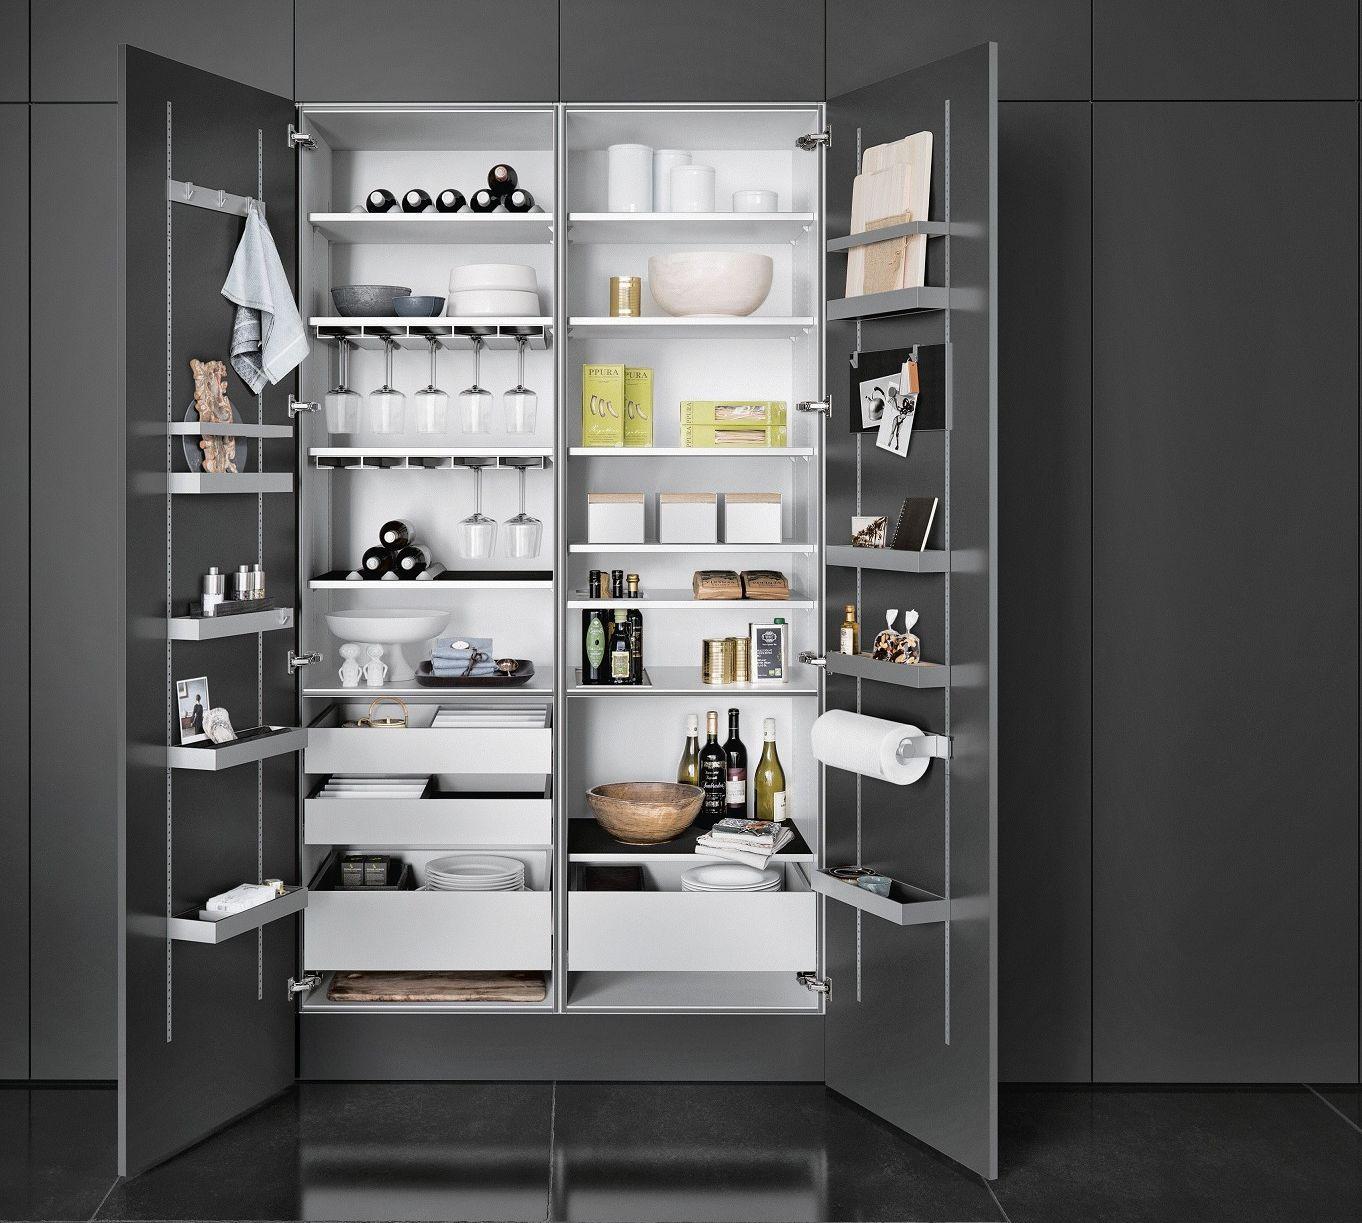 Luxury Kitchen Cabinet Designs in Dubai | SieMatic UAE